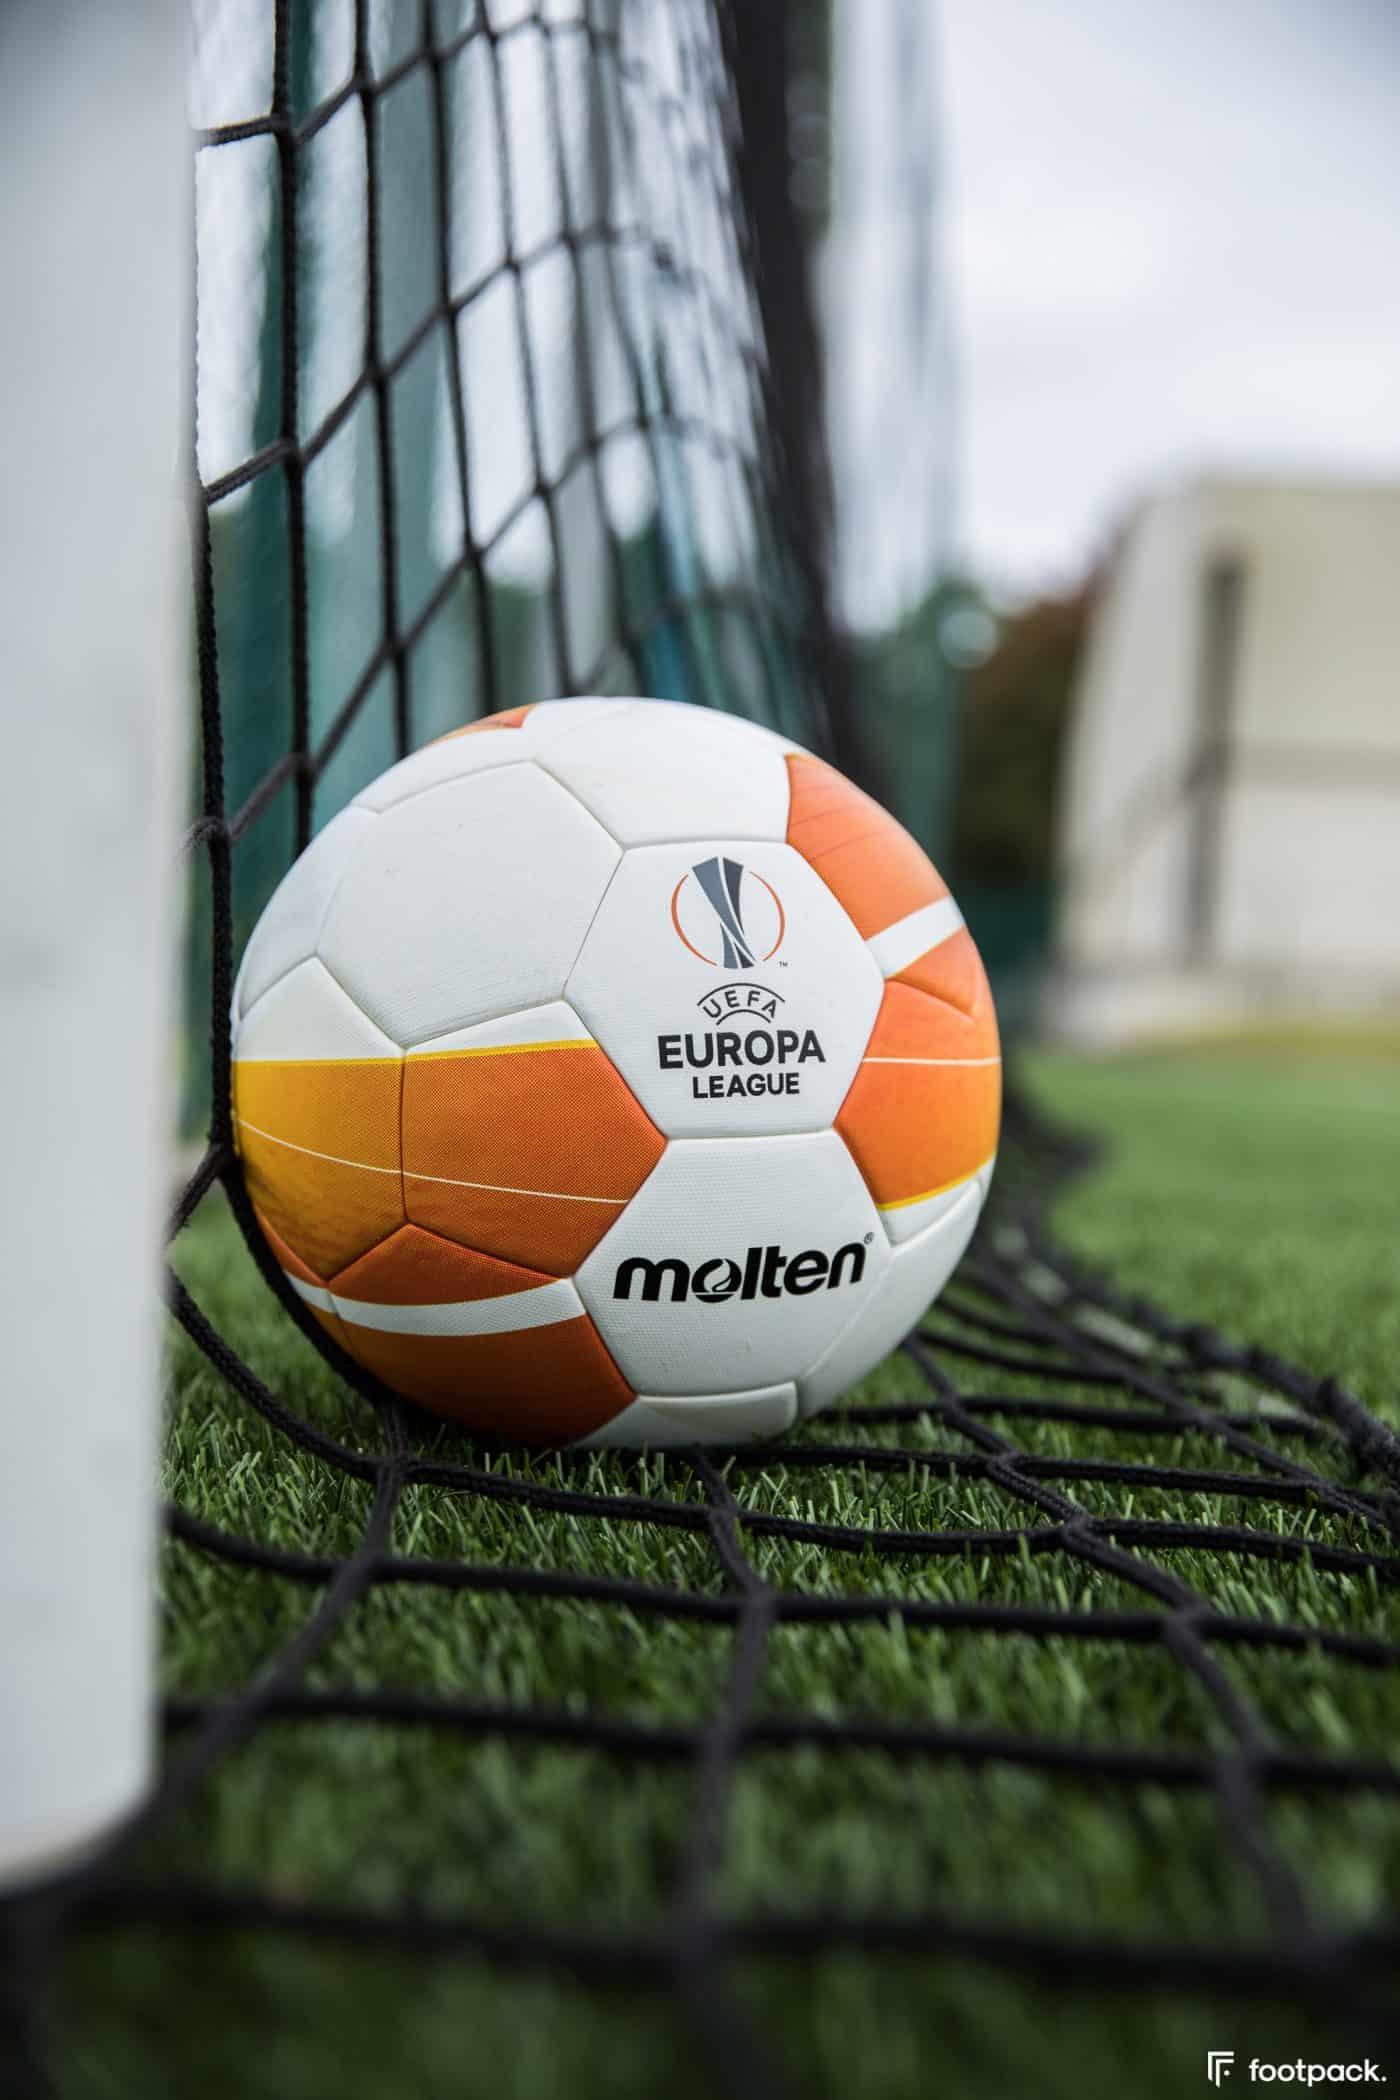 ballon-europa-league-2020-2021-footpack-1